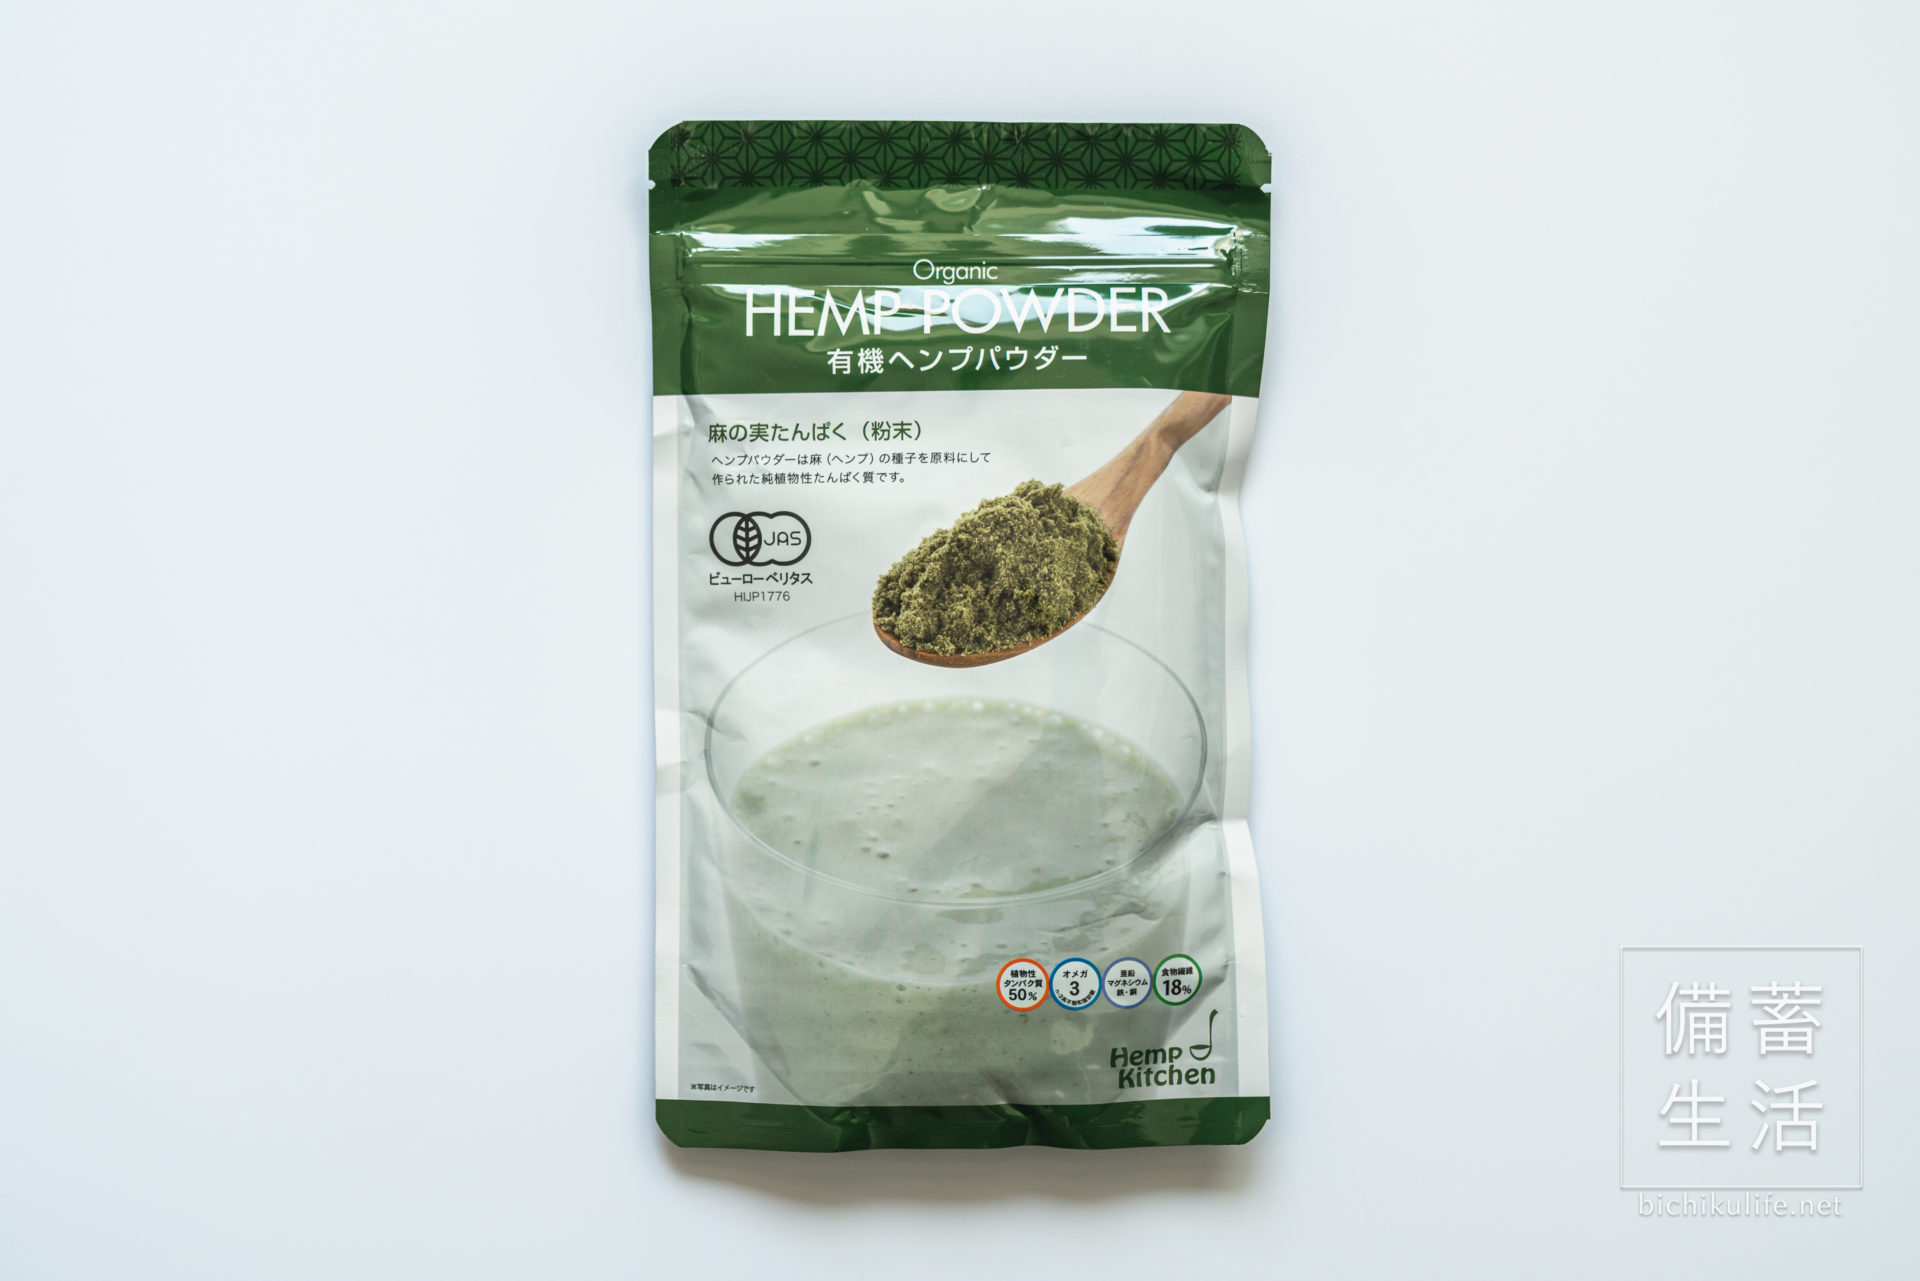 Hemp Kitchen(ヘンプキッチン)の有機ヘンプパウダー、麻の実たんぱく(粉末)